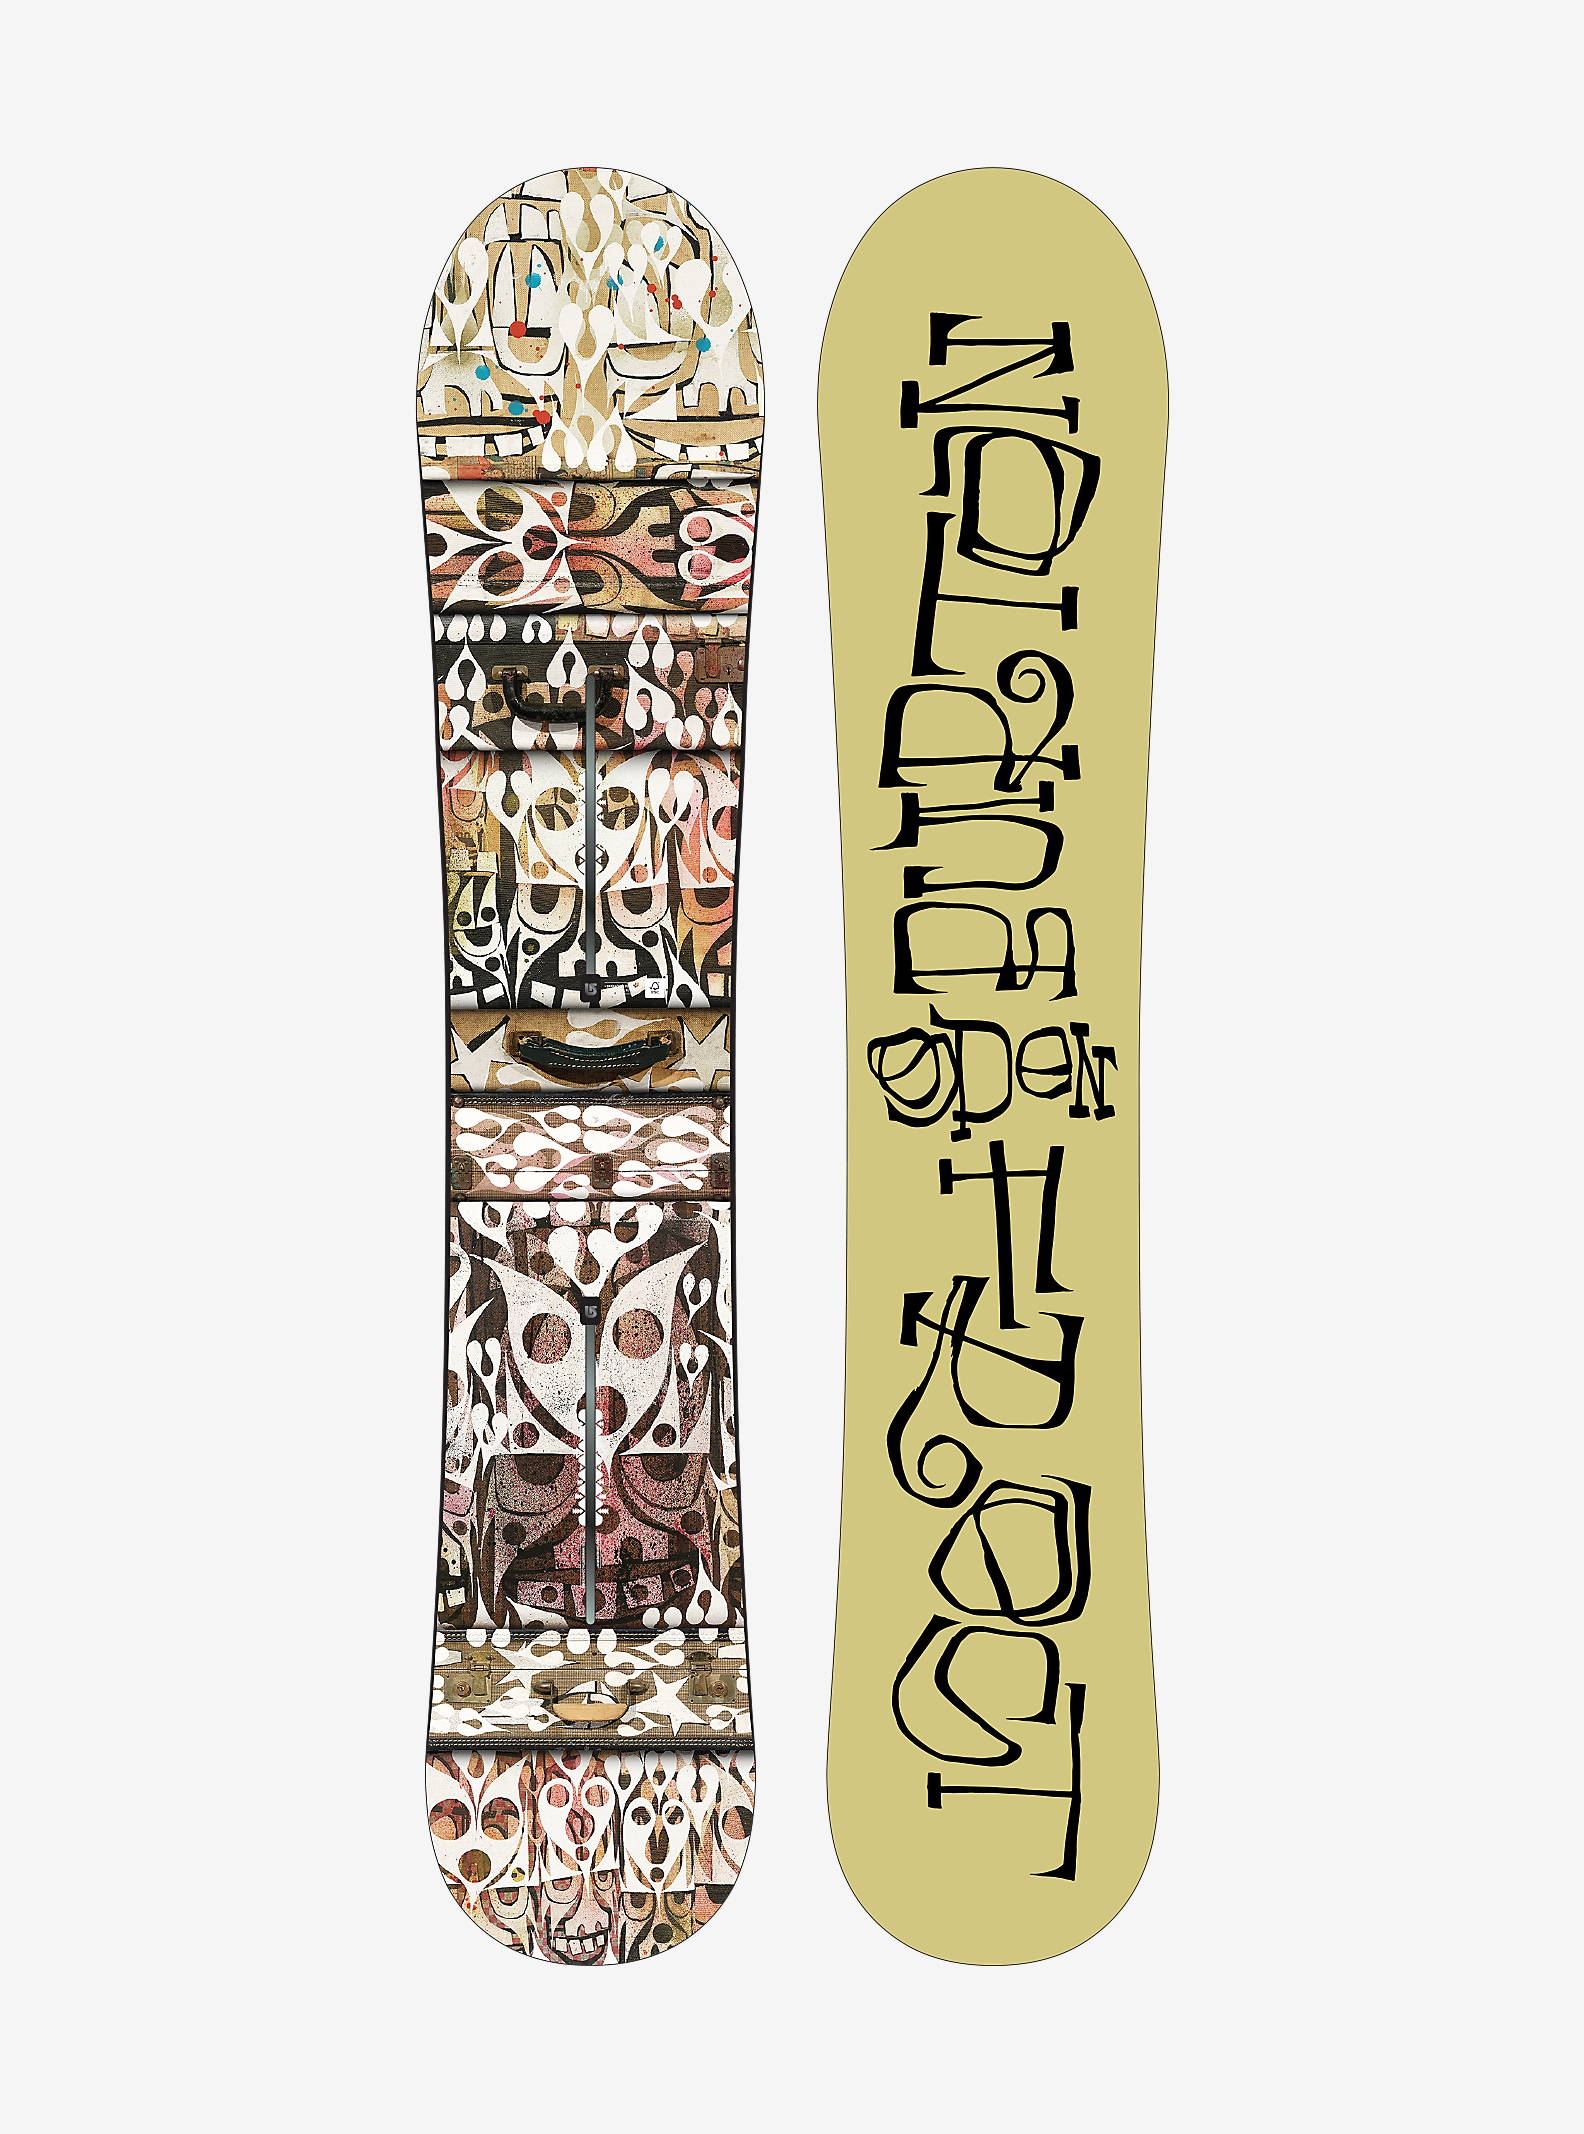 Phil Frost × G Pen × Burton Barracuda Snowboard shown in 157